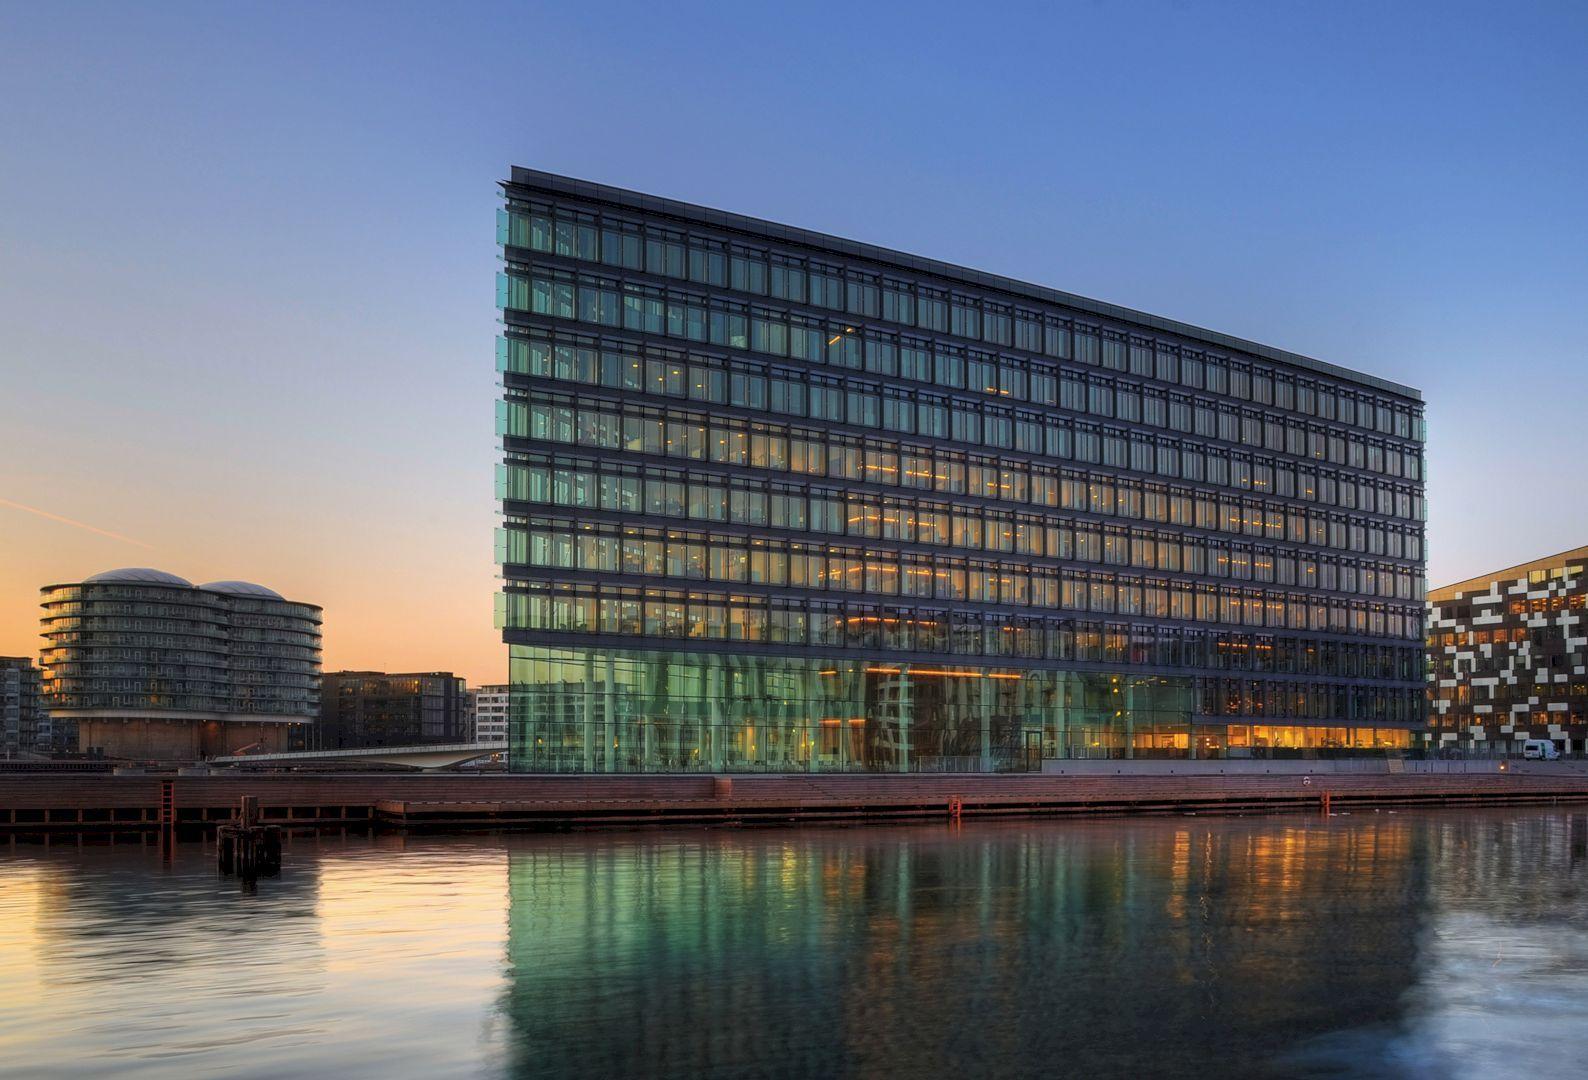 Aller media building flexible interior design for innovative work environment architecture also rh pinterest